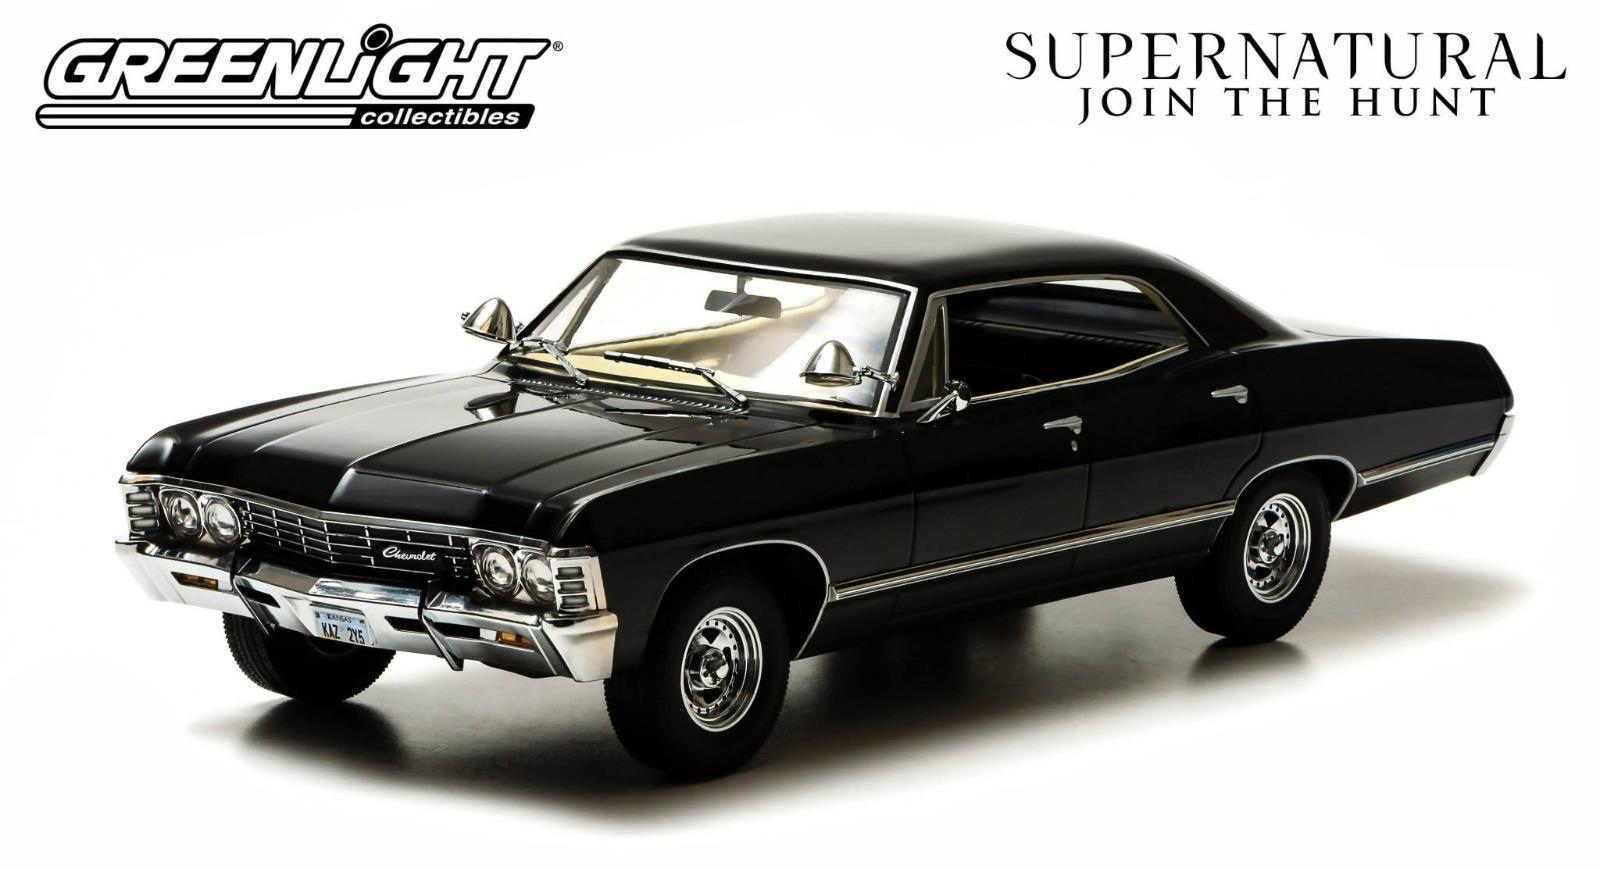 supernatural 1967 chevrolet impala sport sedan 4 doors. Black Bedroom Furniture Sets. Home Design Ideas